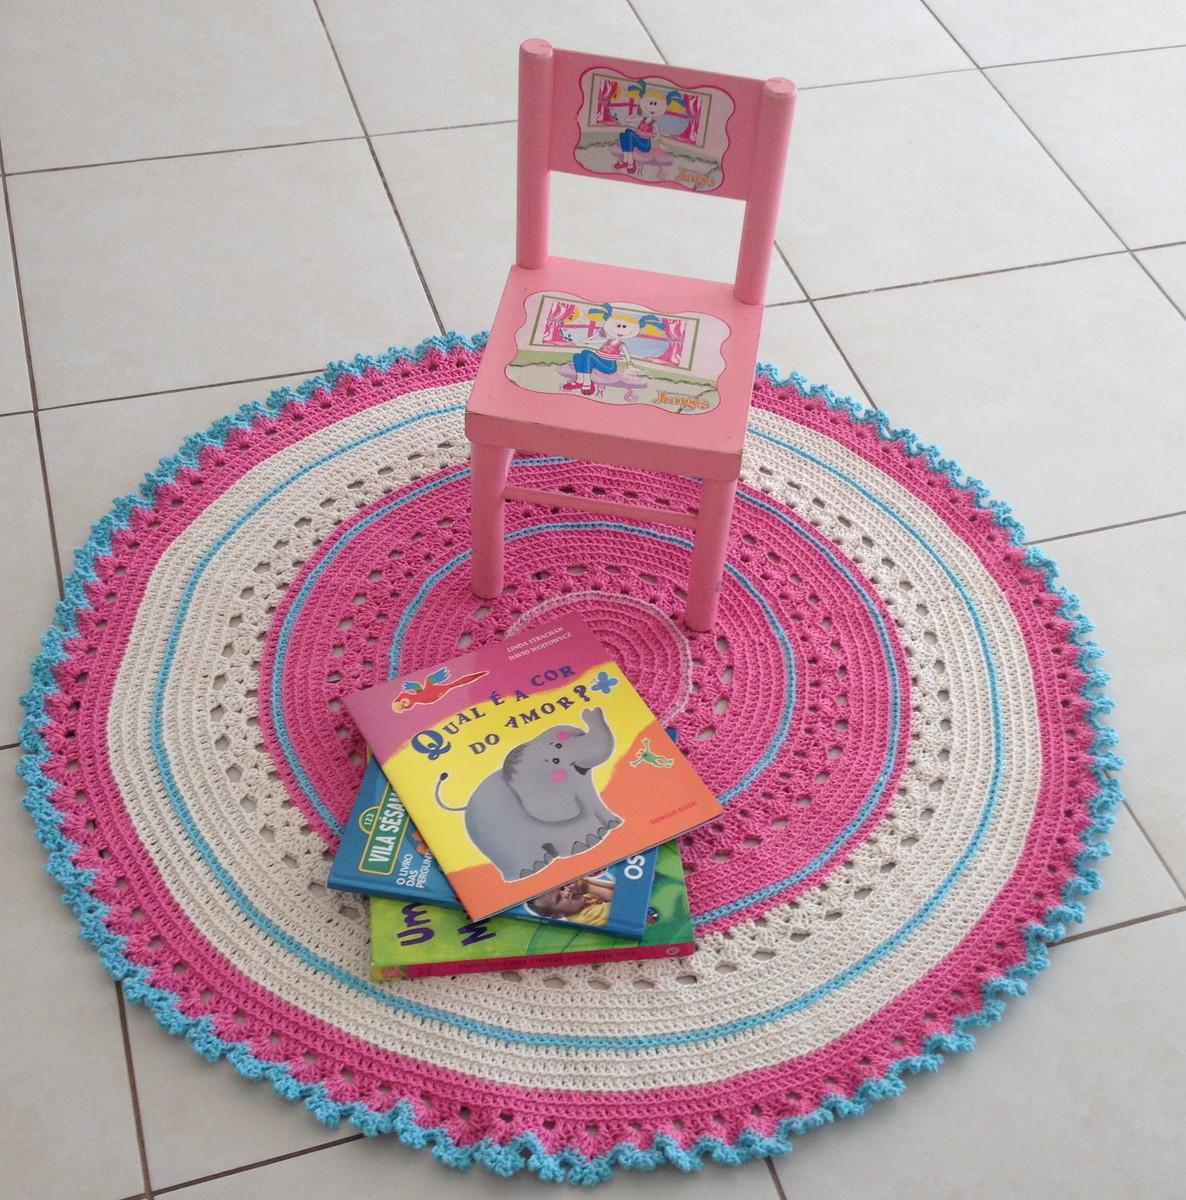 tapete rosa e azul baby maria fernanda ateli vera peixoto elo7. Black Bedroom Furniture Sets. Home Design Ideas